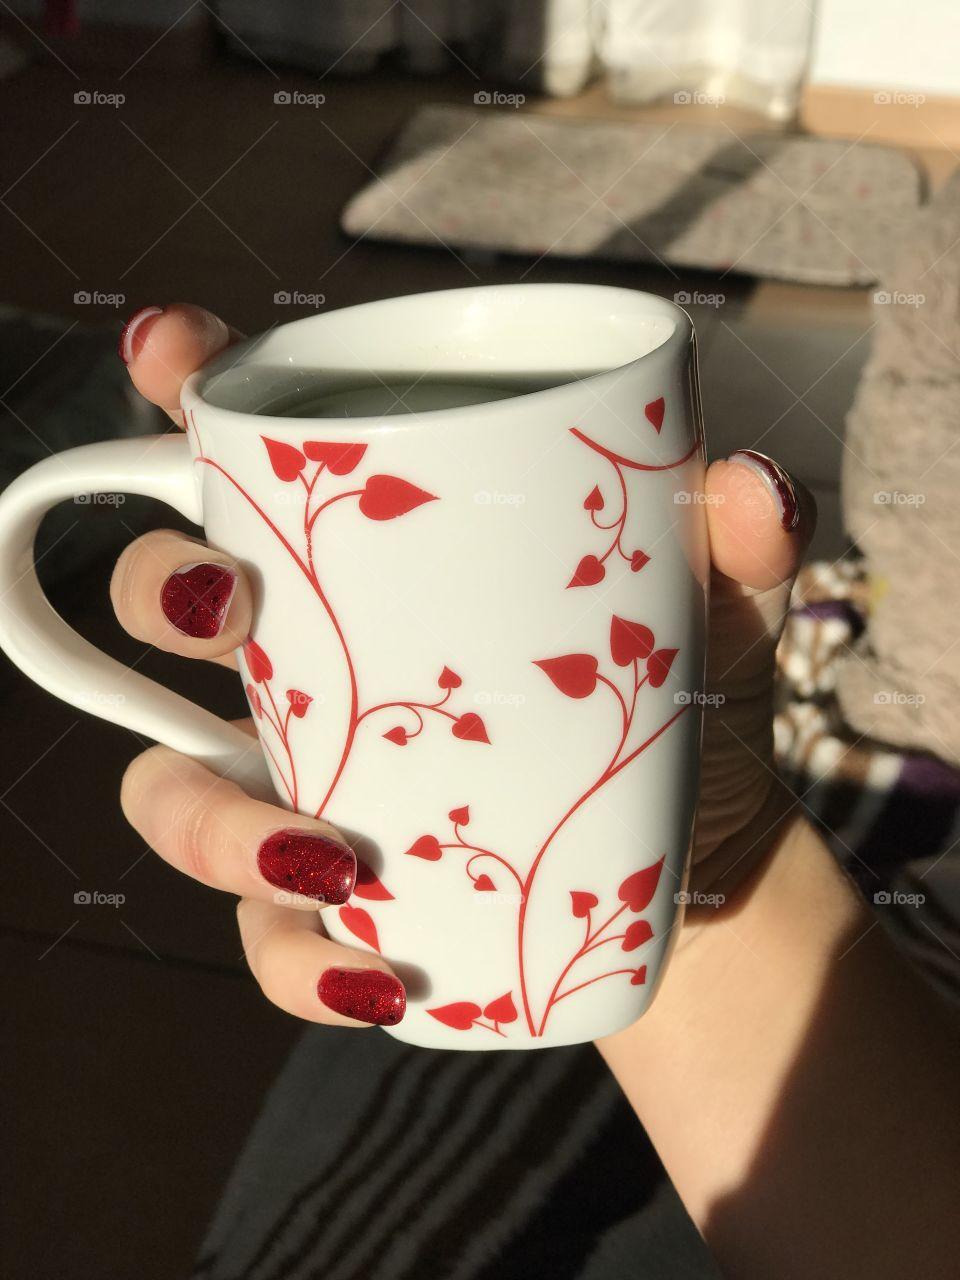 Cup of tea matcha